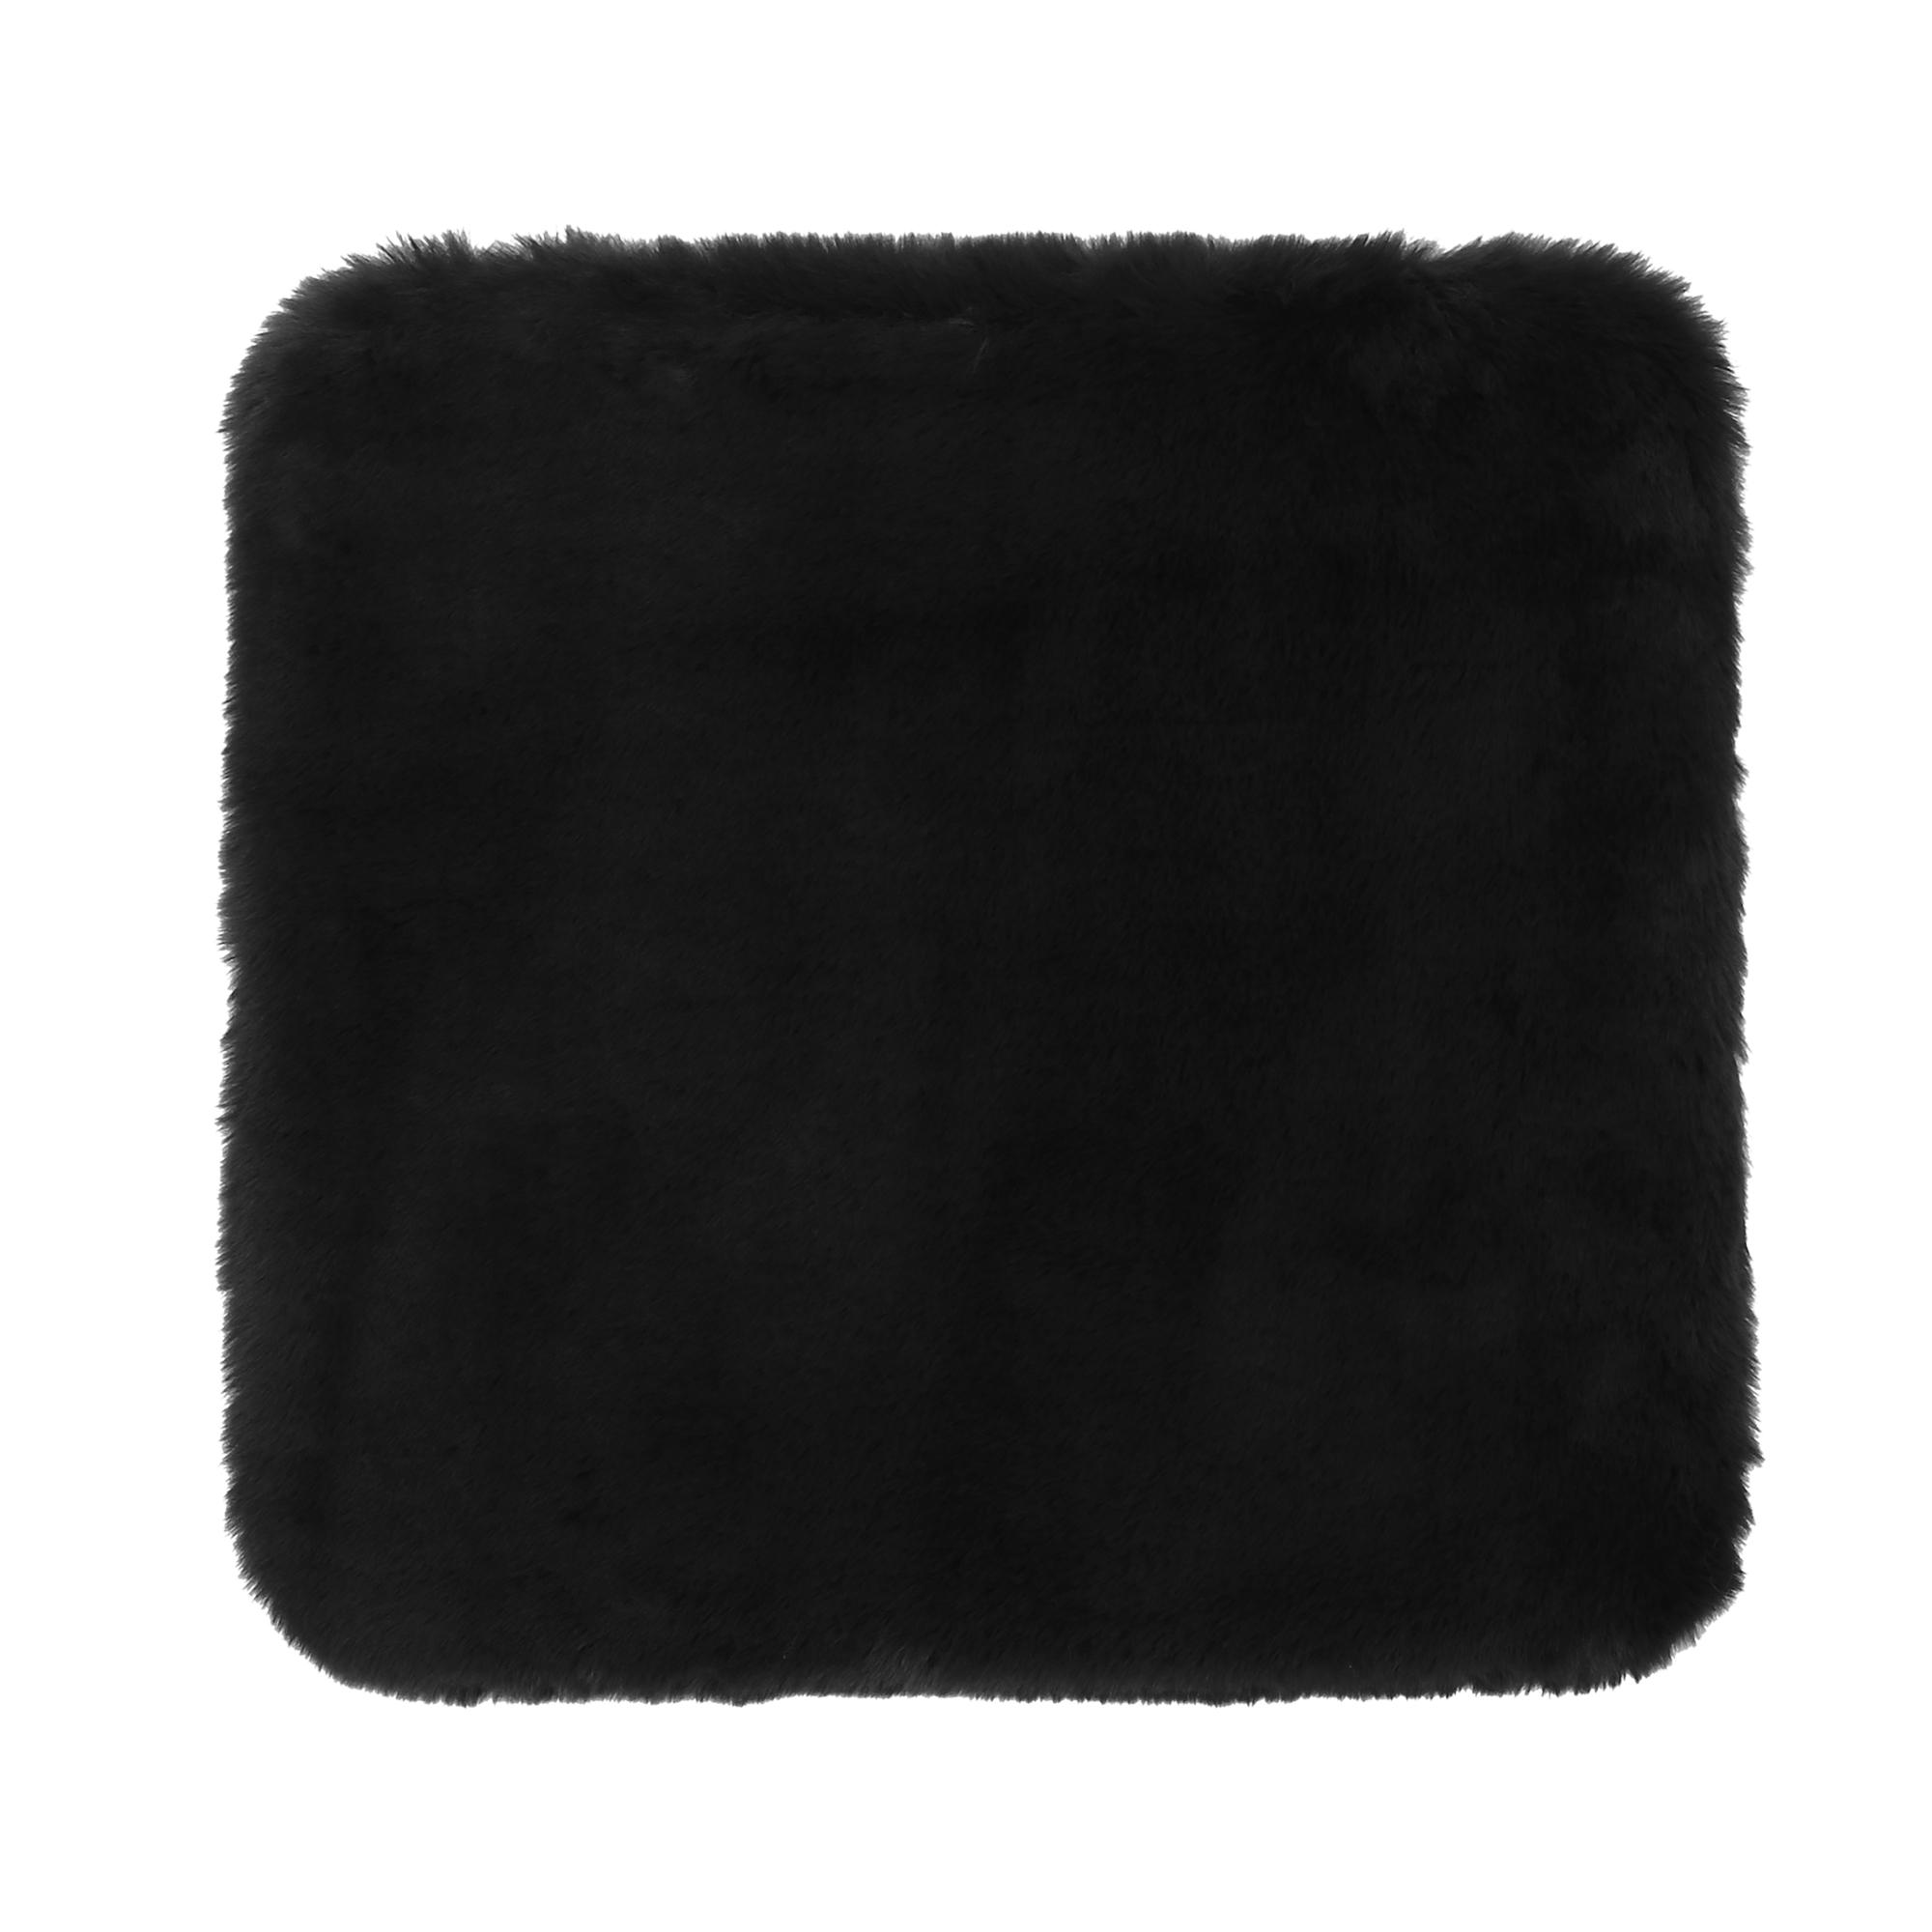 Universal Soft Faux Plush Cushion Warm Interior Seat Cover Pad for Auto Black